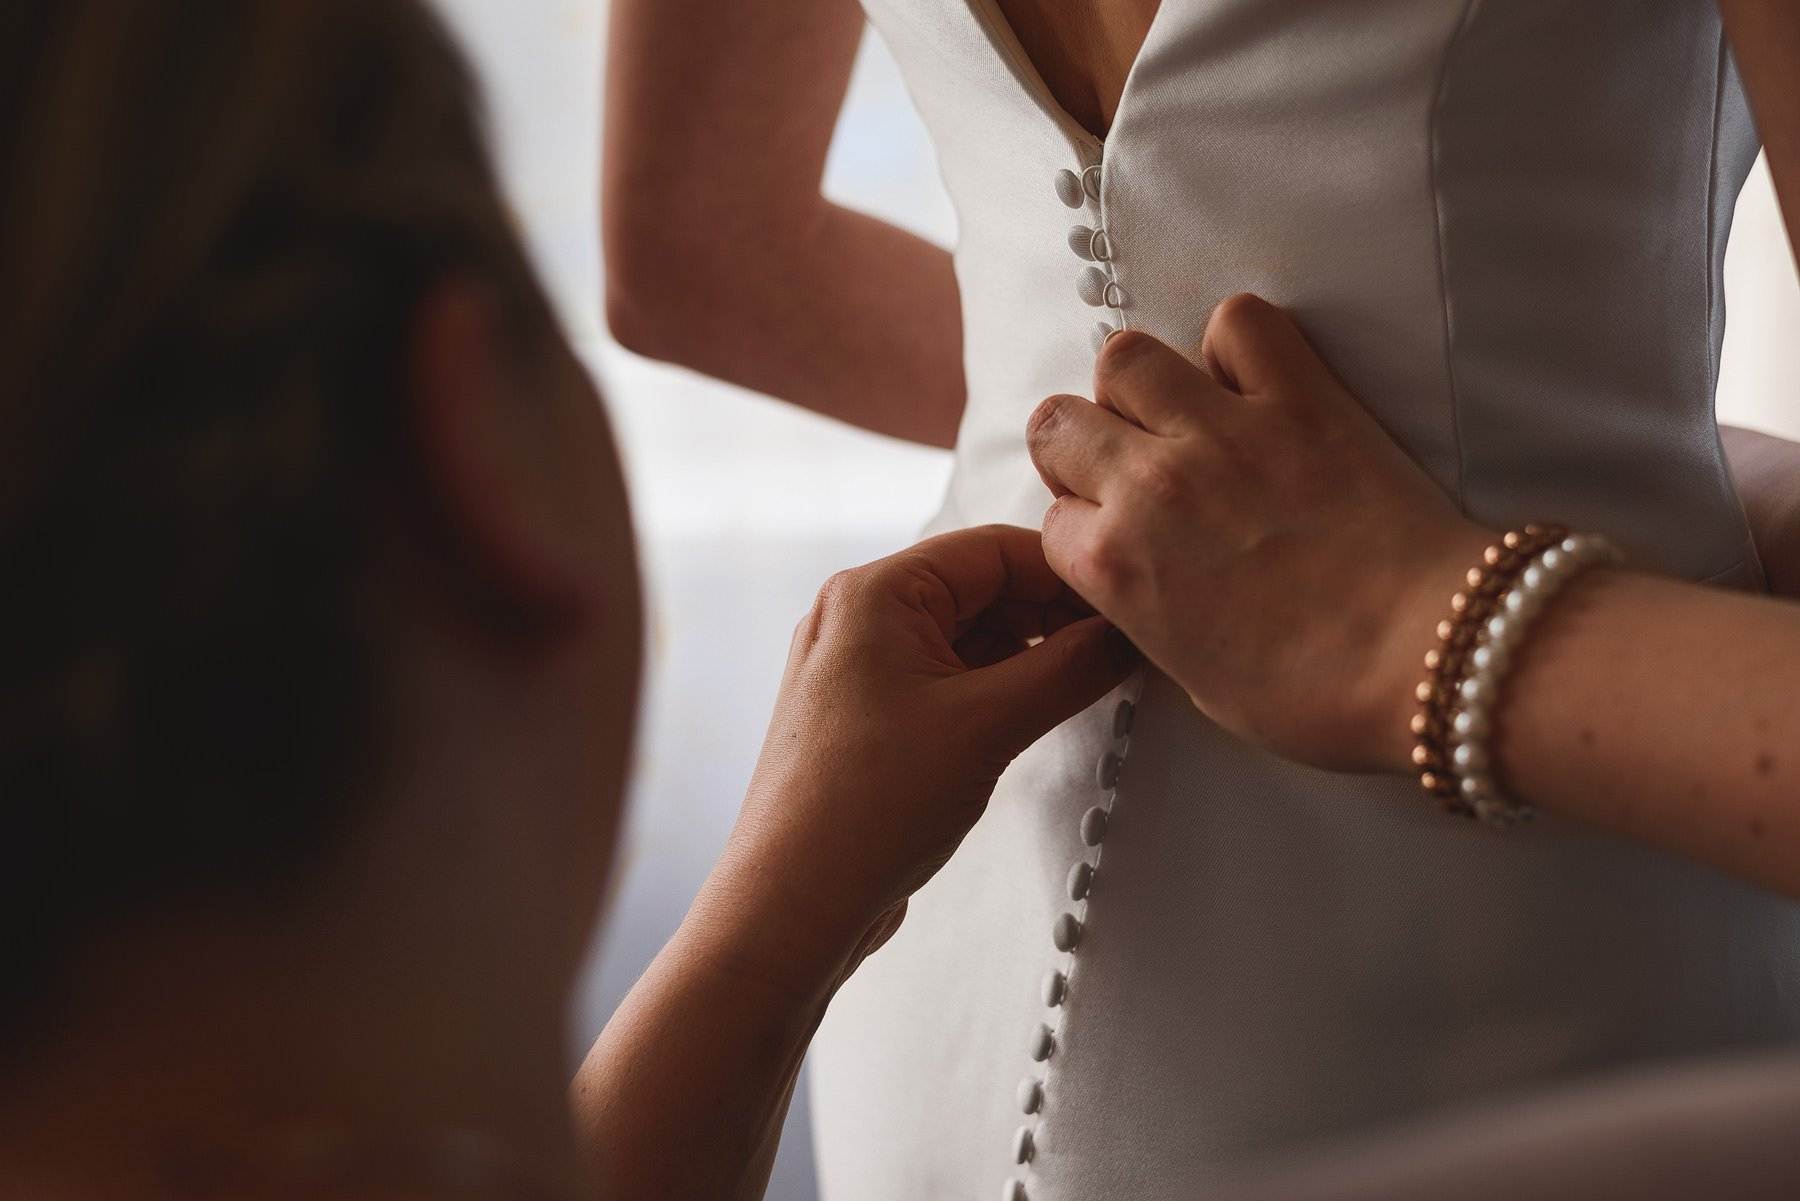 bridesmaid doing up wedding dress